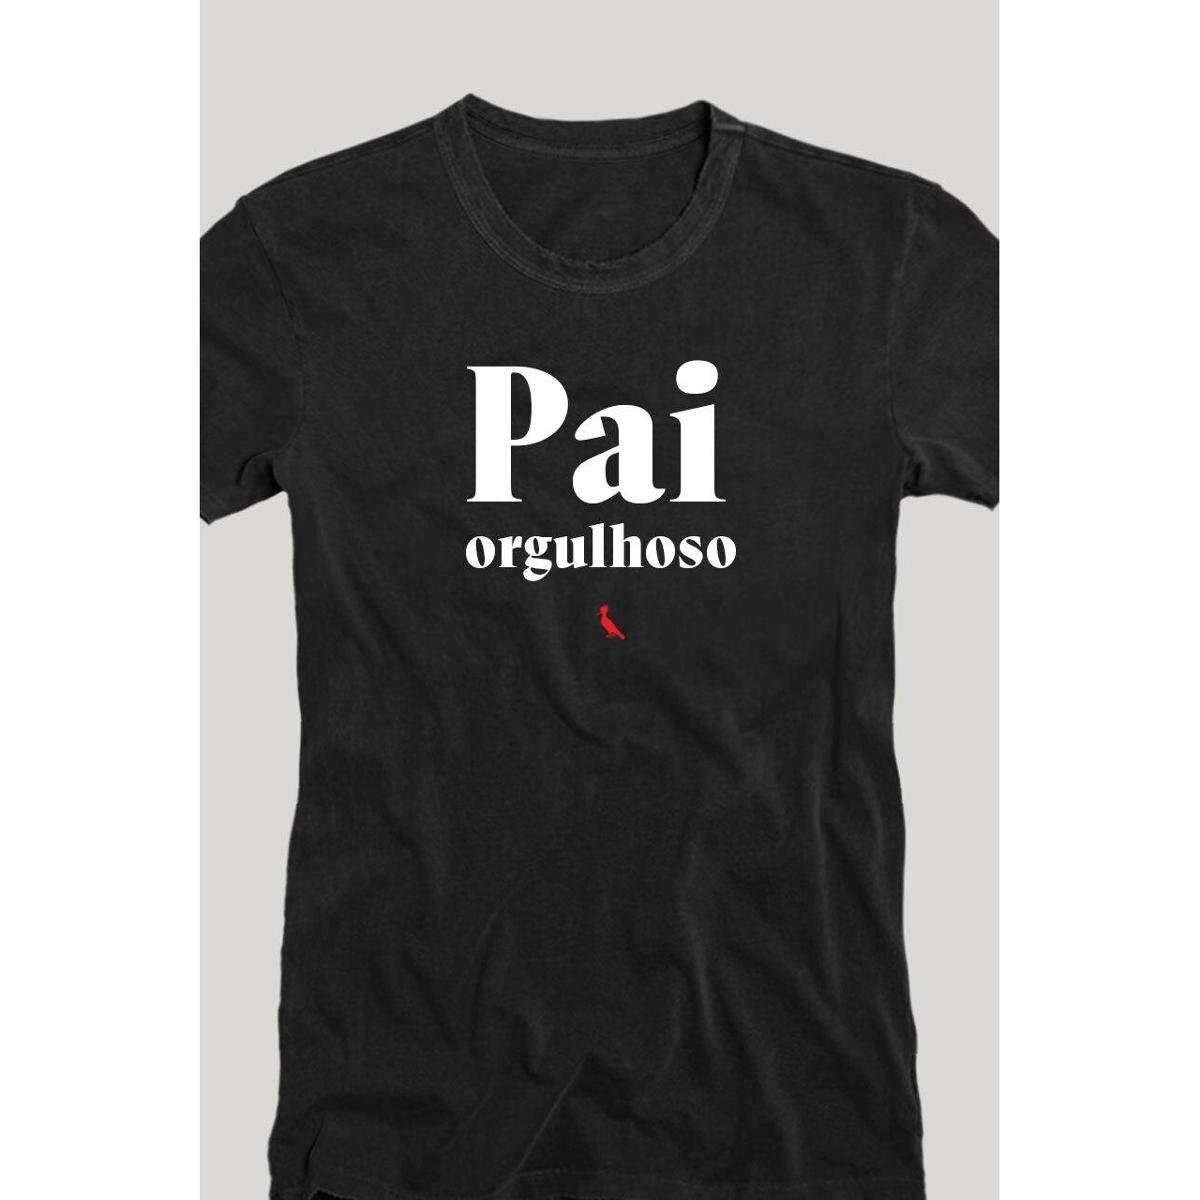 Camiseta Reserva Pai Orgulhoso Masculina - Preto